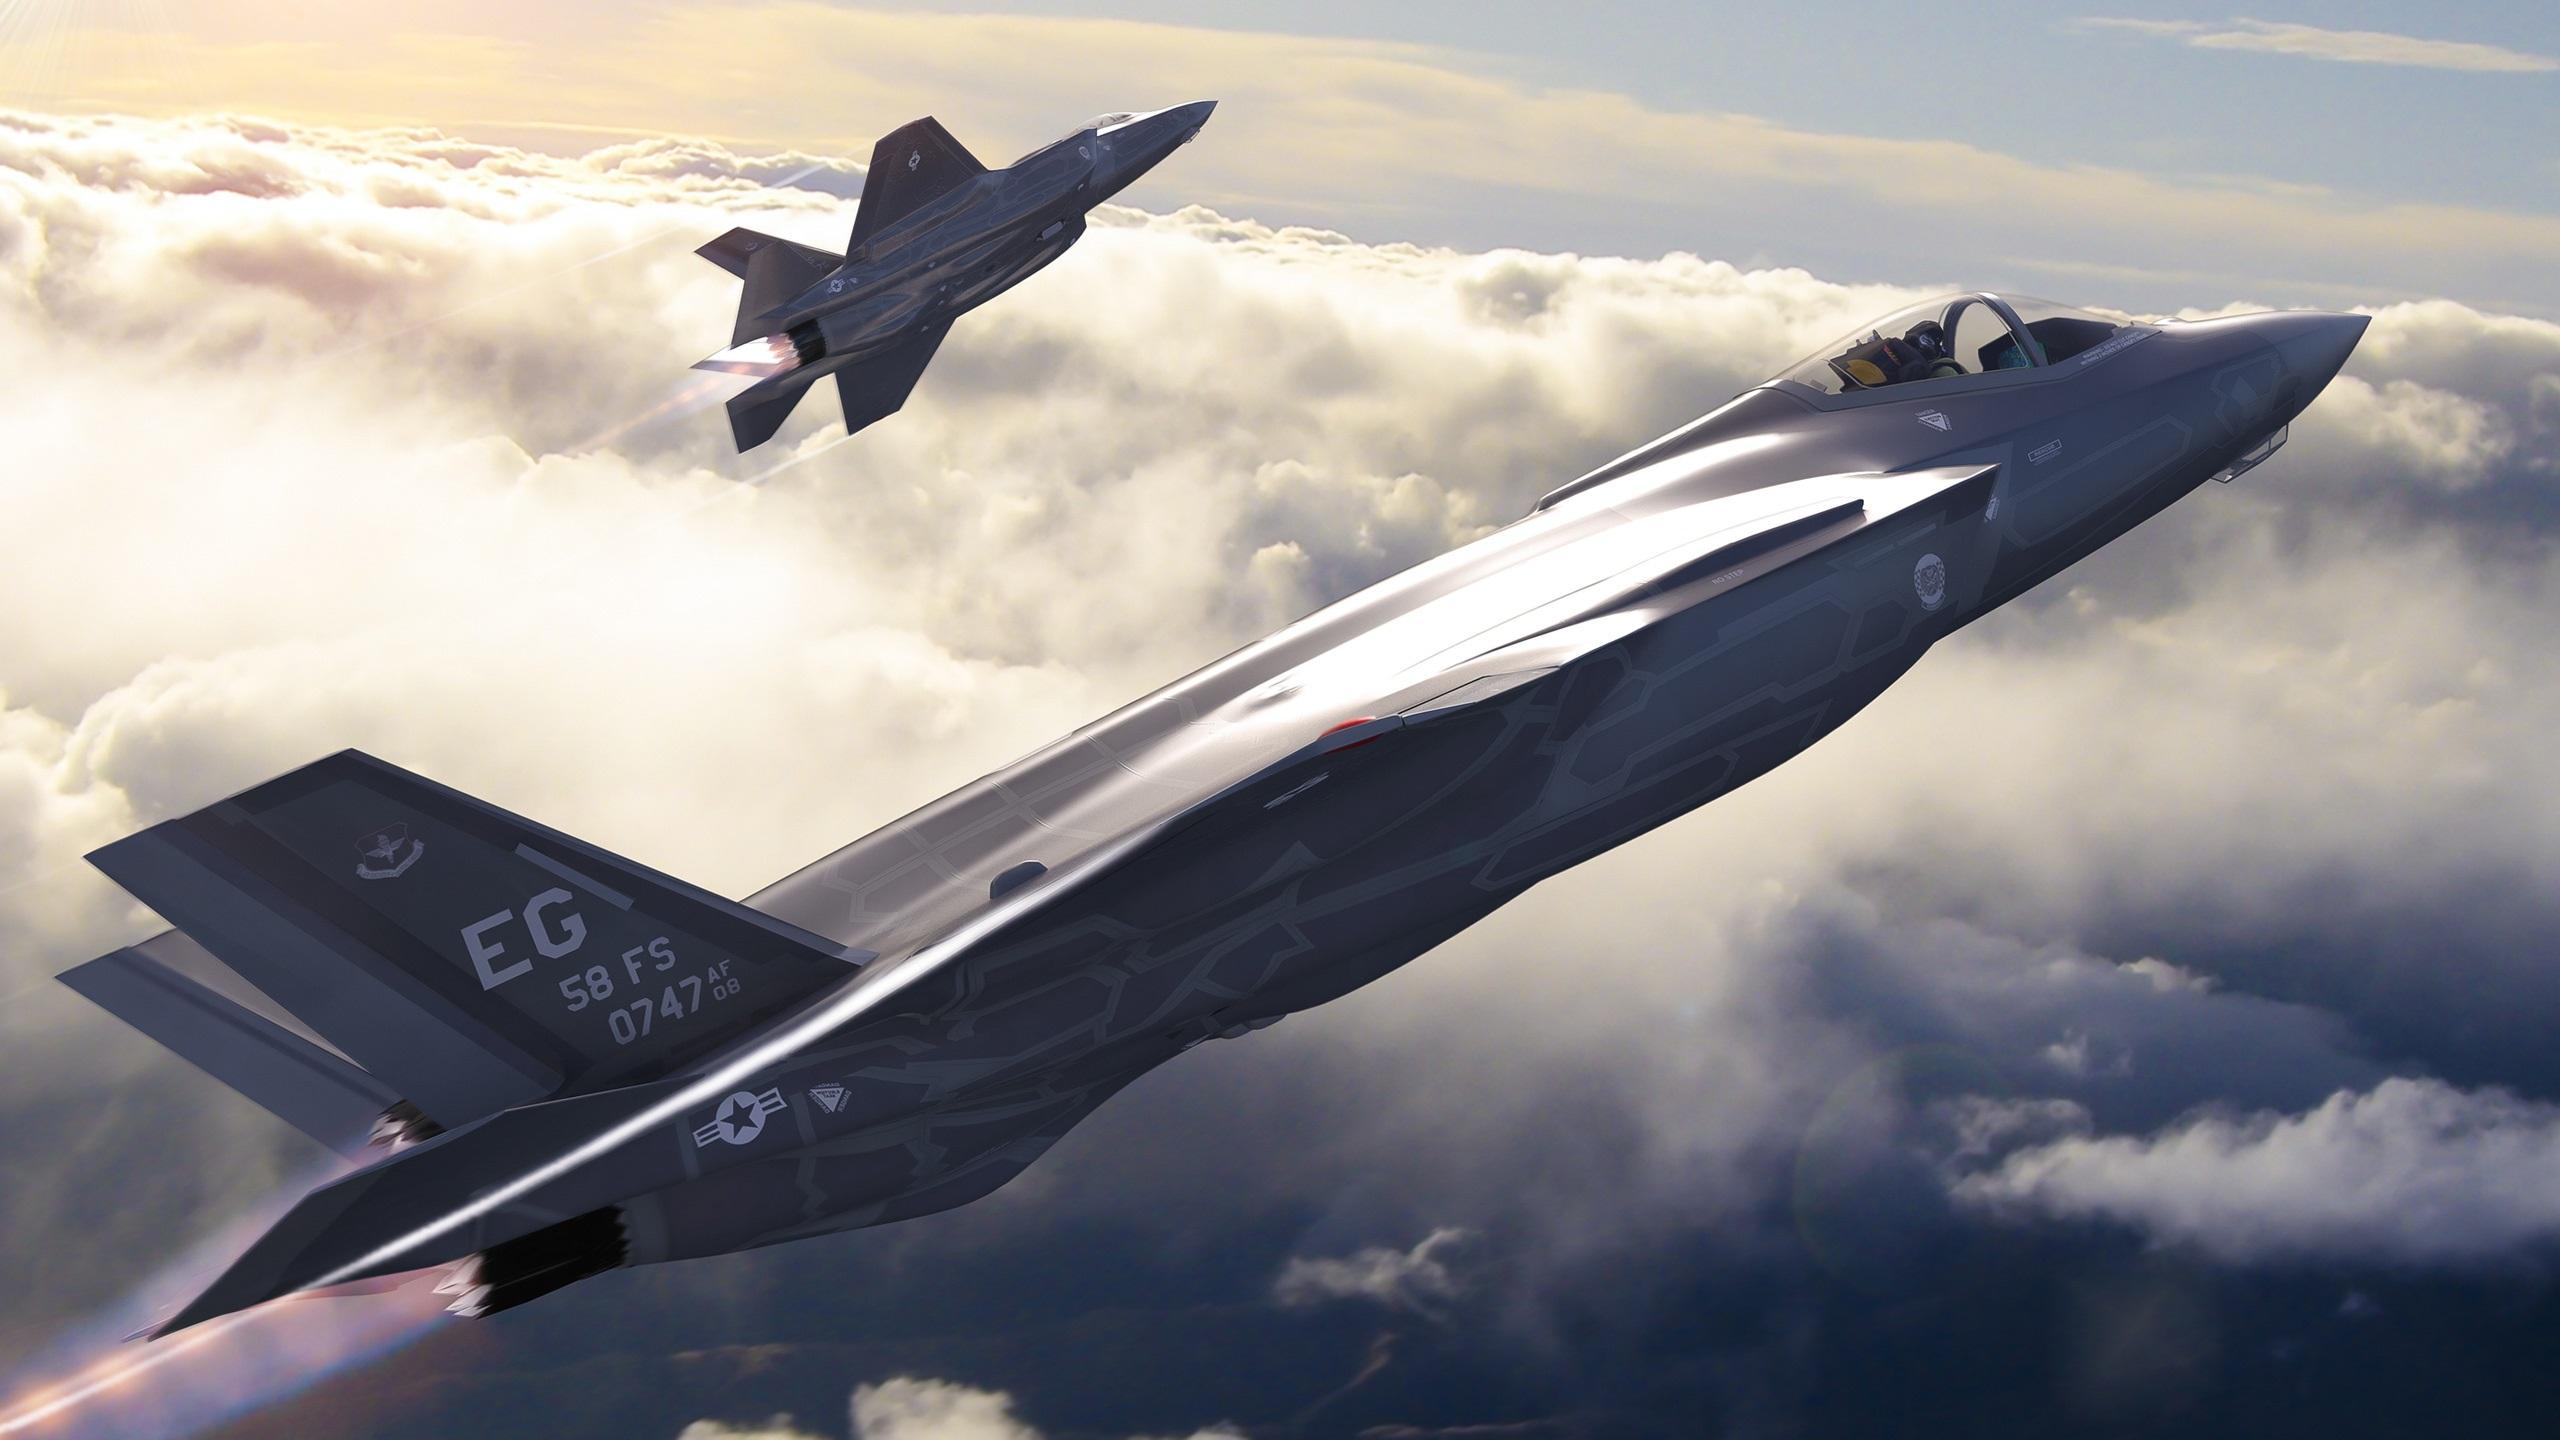 F 35 (戦闘機)の画像 p1_40